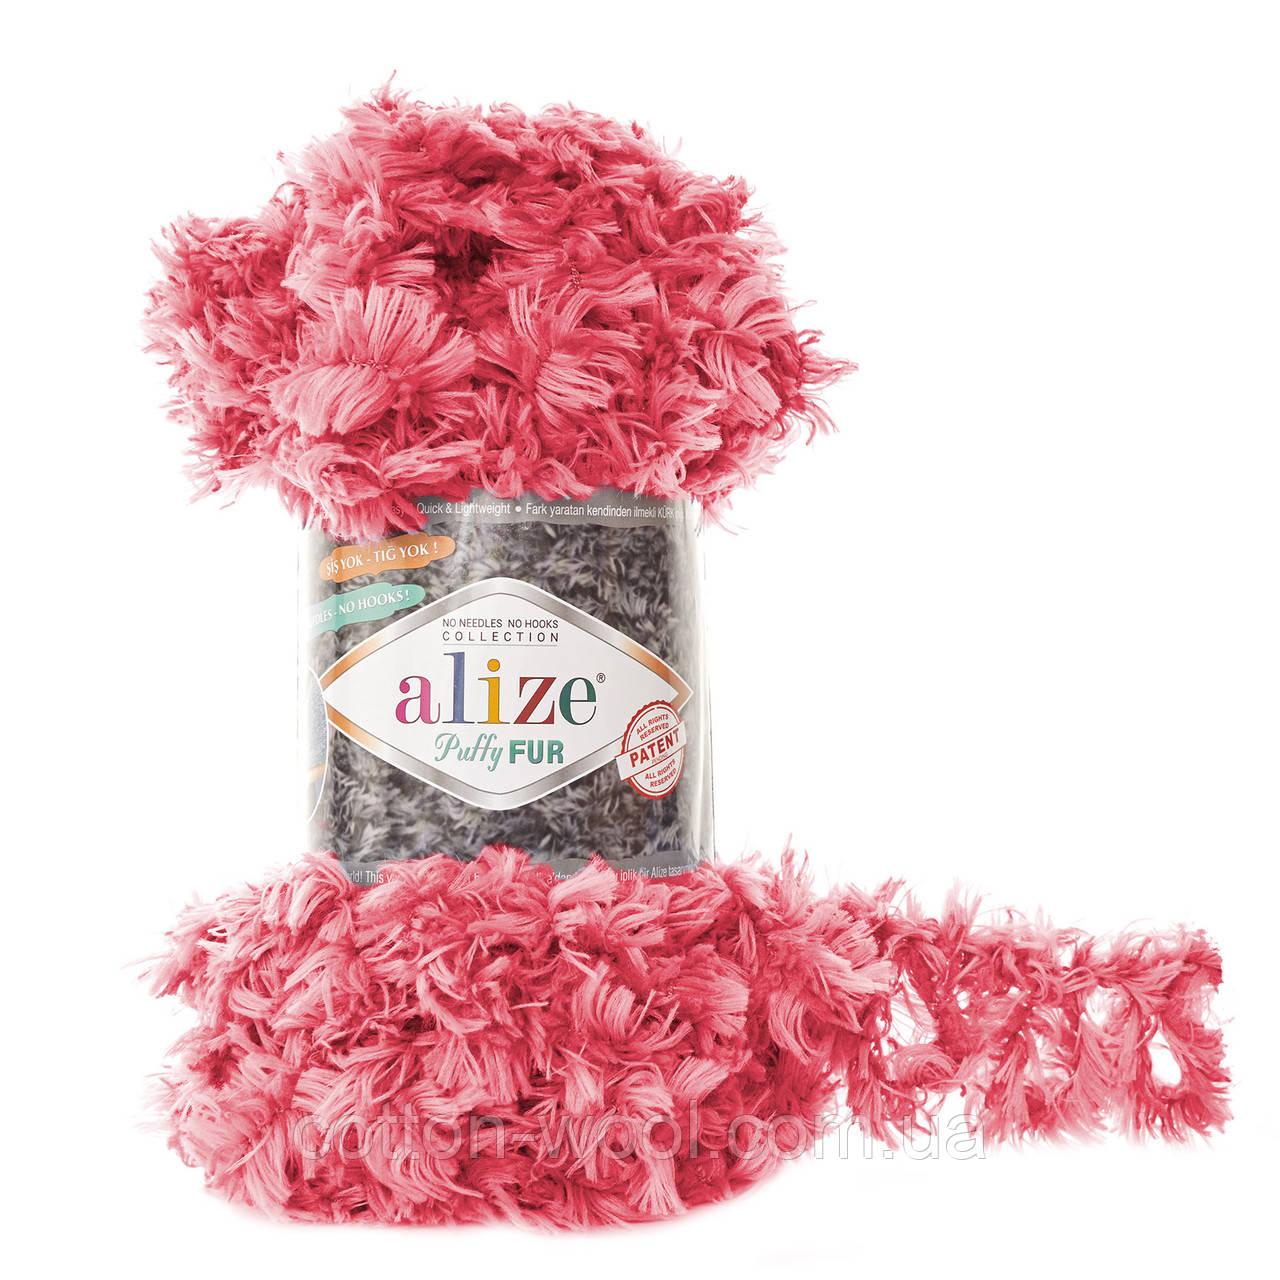 Puffy Fur (Паффі Фур) (100% - поліестер) 6115